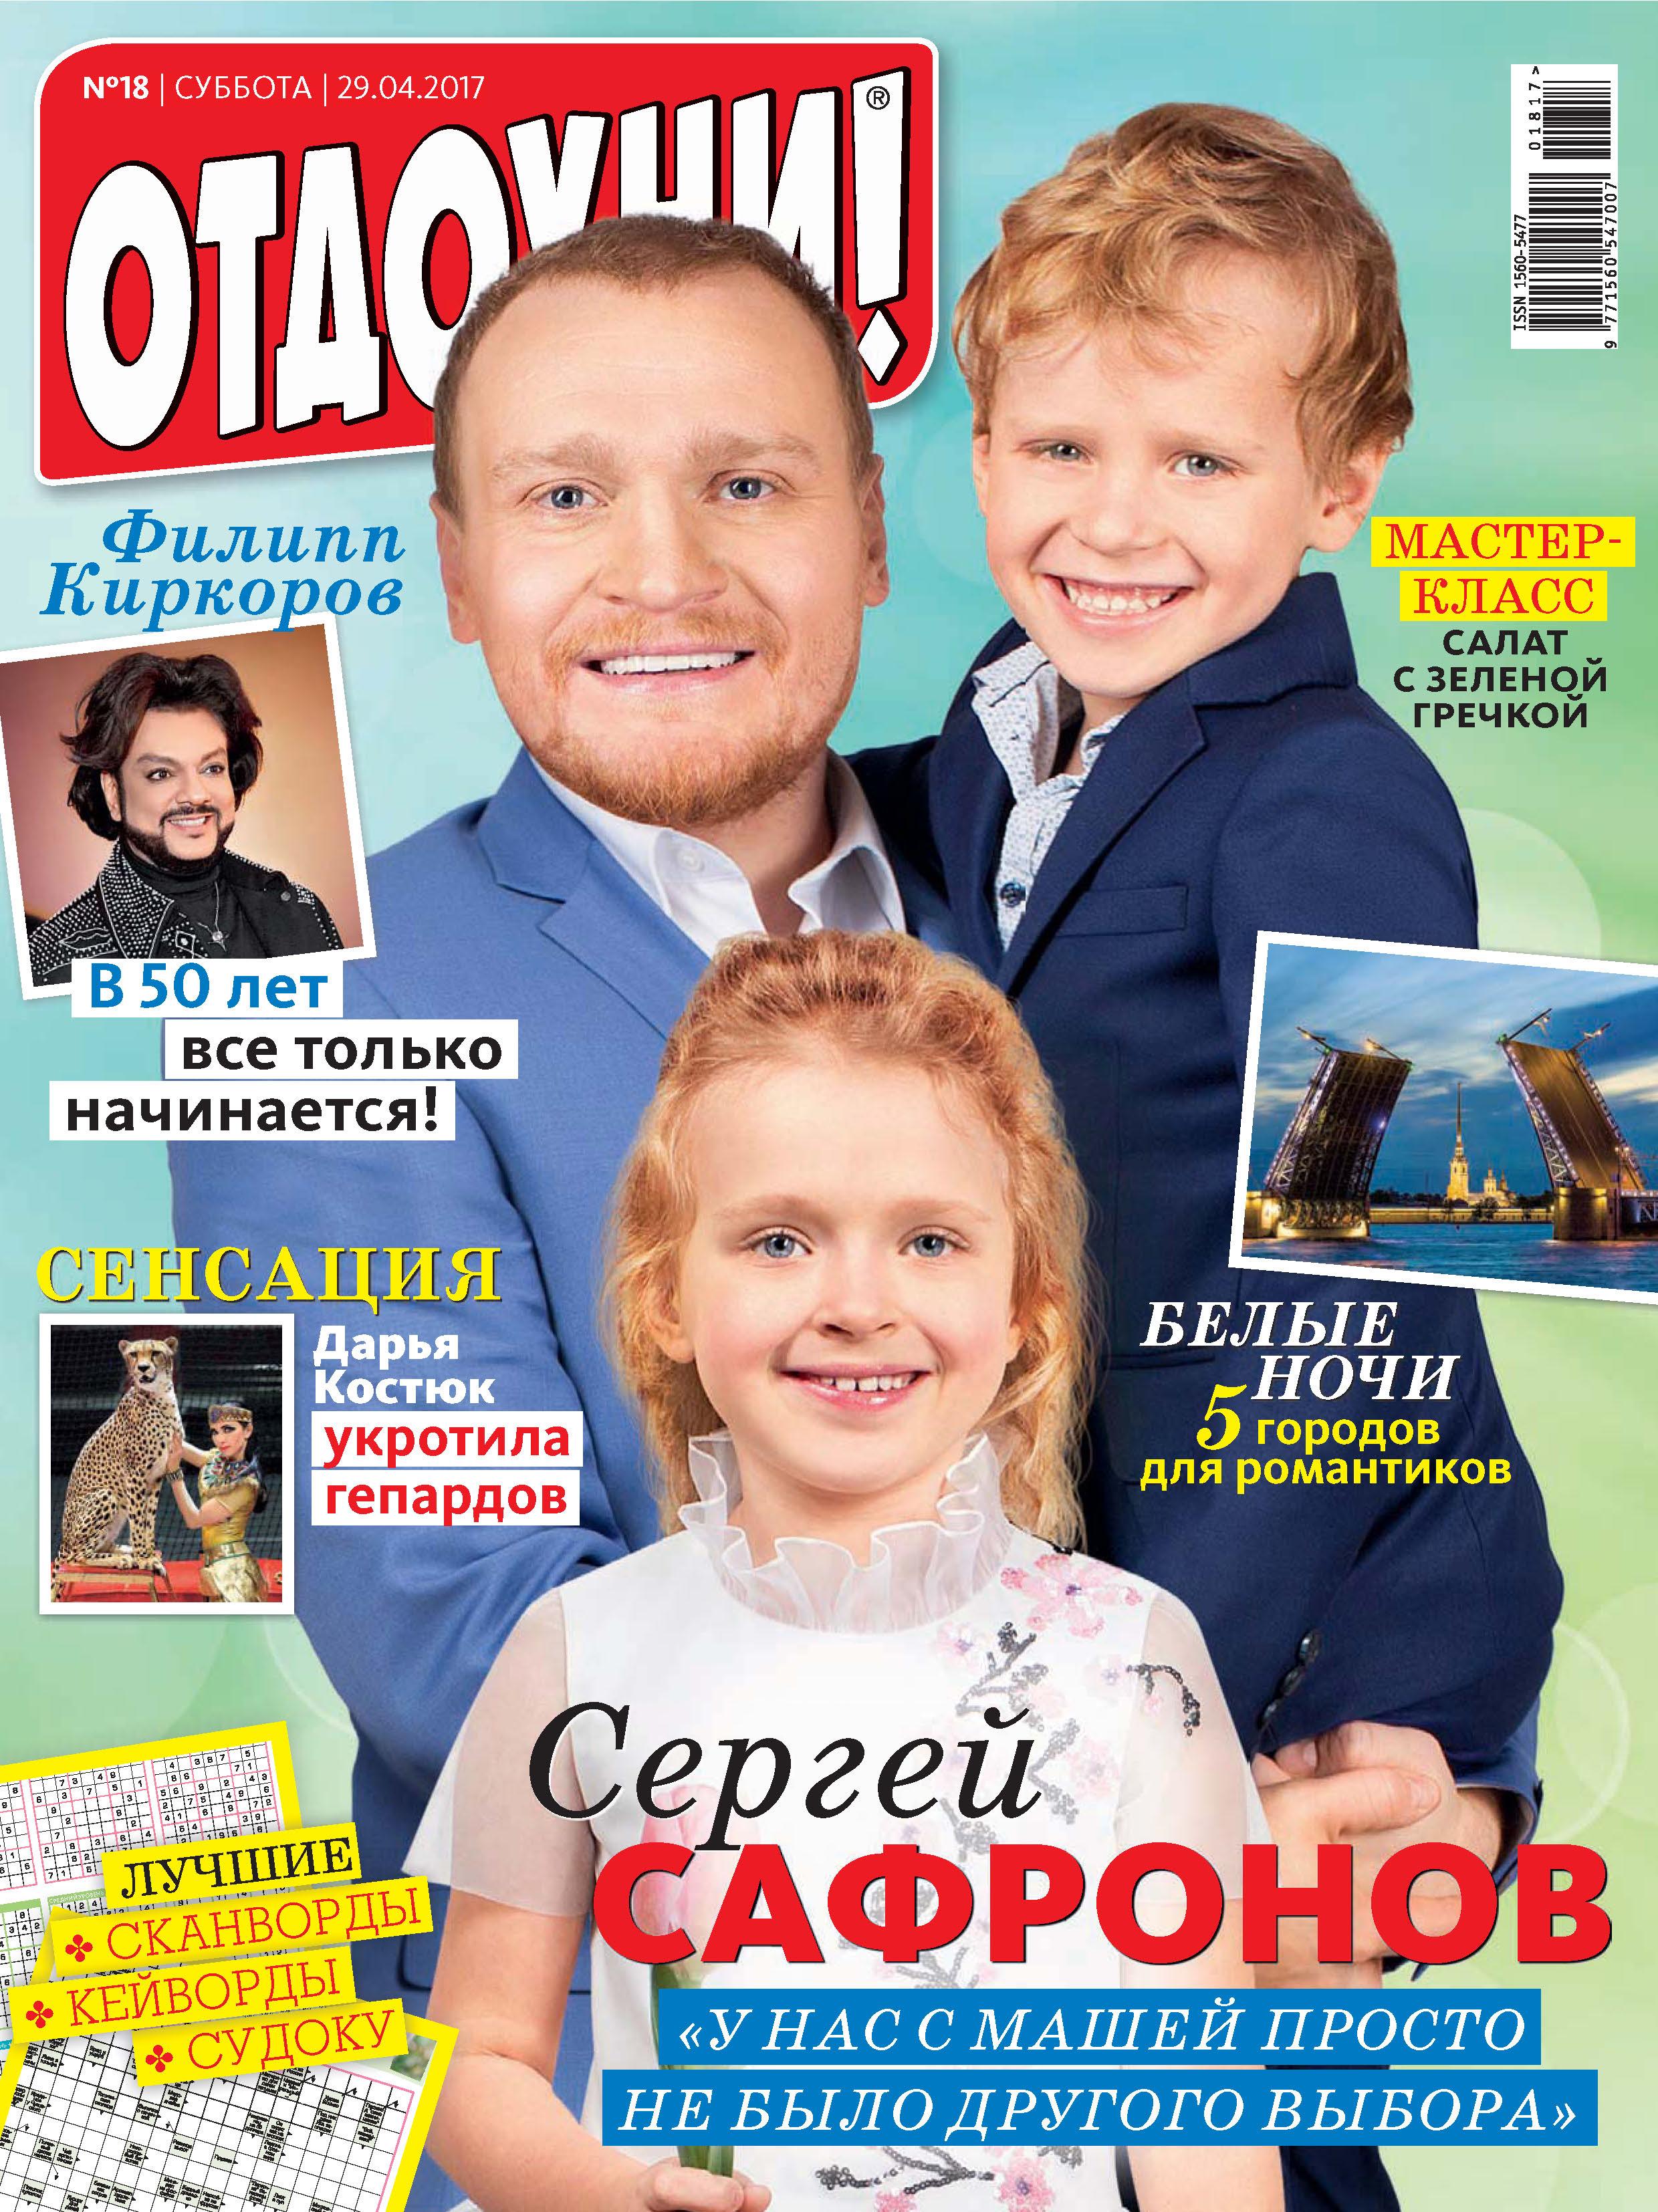 ИД «Бурда» Журнал «Отдохни!» №18/2017 ид бурда журнал отдохни 12 2017